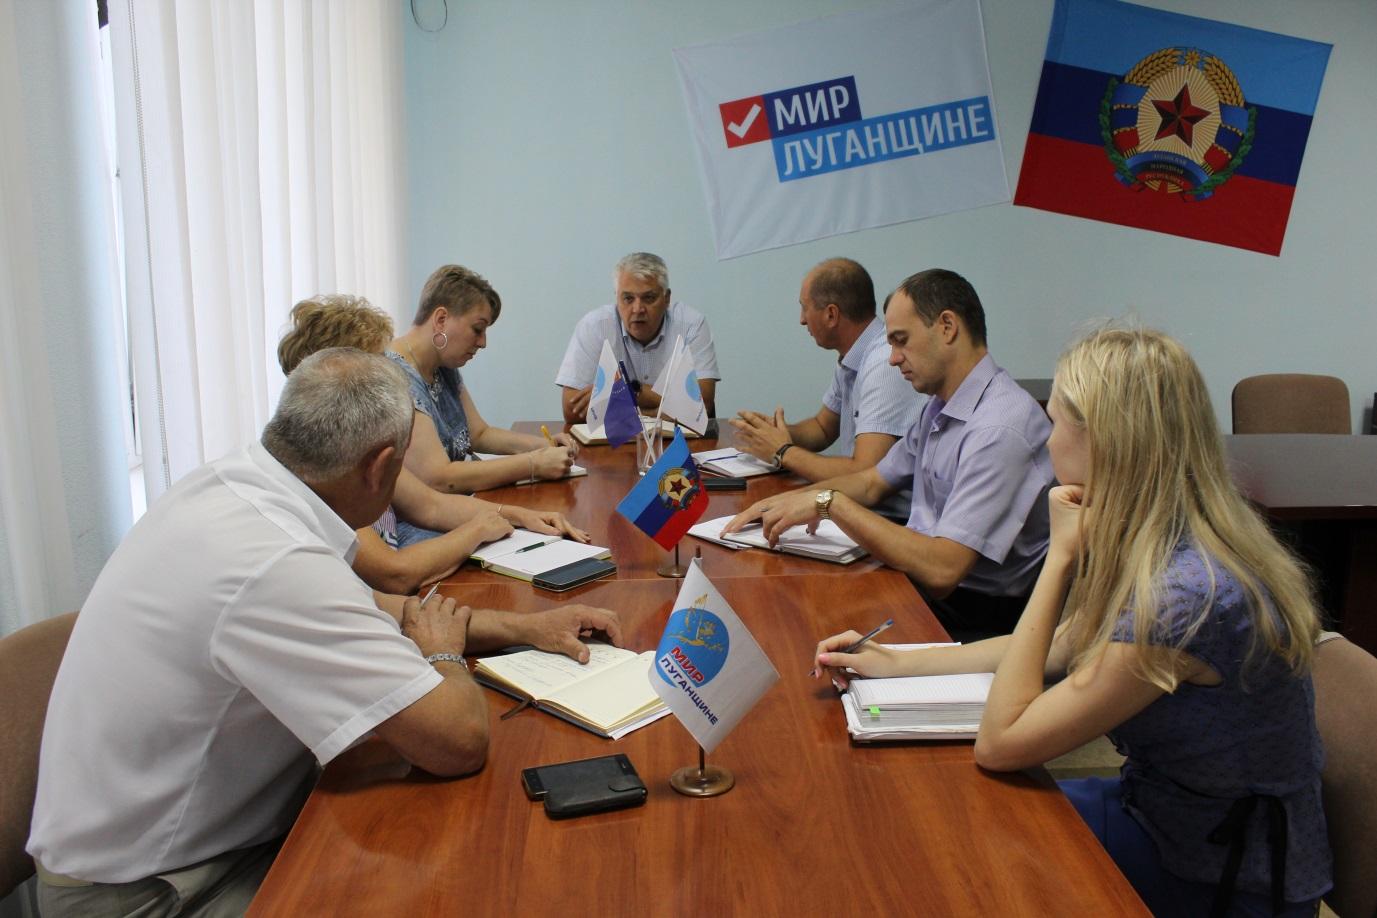 Исполняющий обязанности Председателя Государственного таможенного комитета ЛНР провел прием в Славяносербске 1